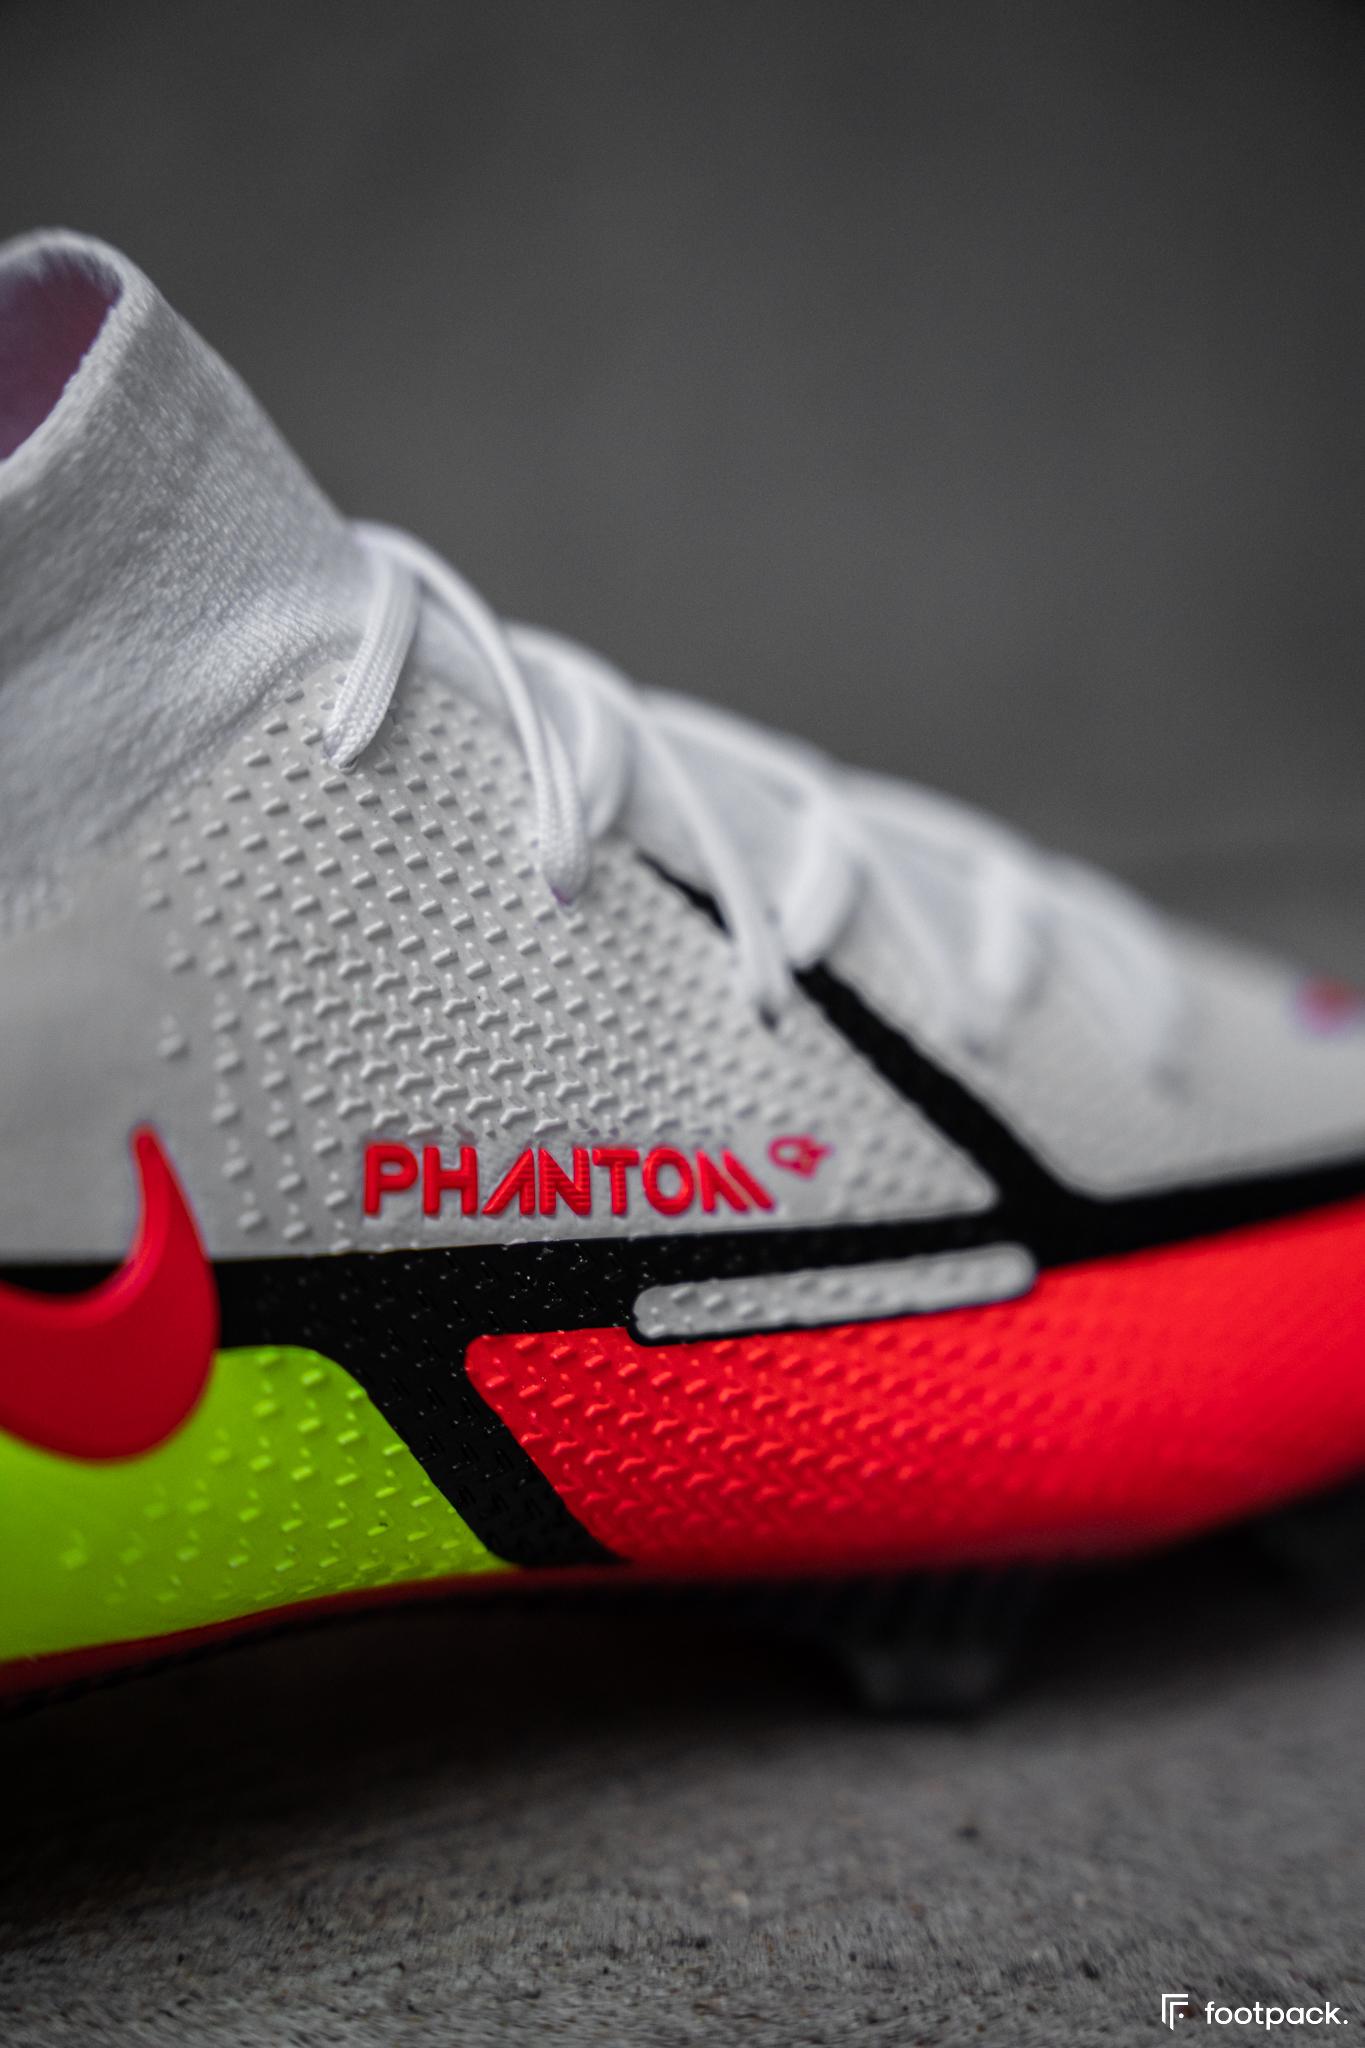 Nike Phantom GT 2 Motivation Pack - footpack.